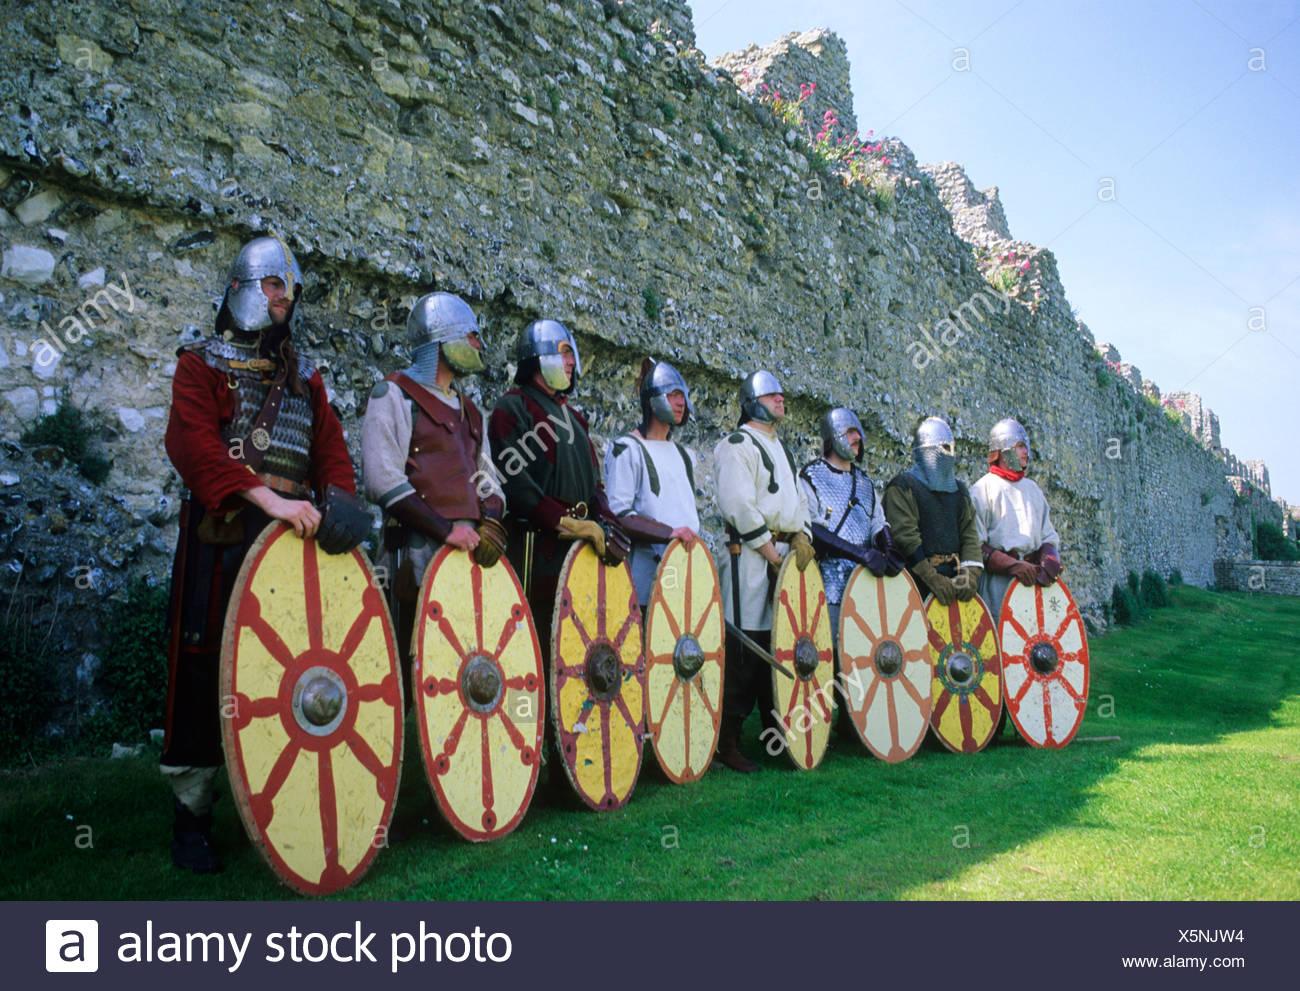 Romano British Saxon Warriors shields armour 5th century English history re-enactment helmets soldiers military England UK - Stock Image